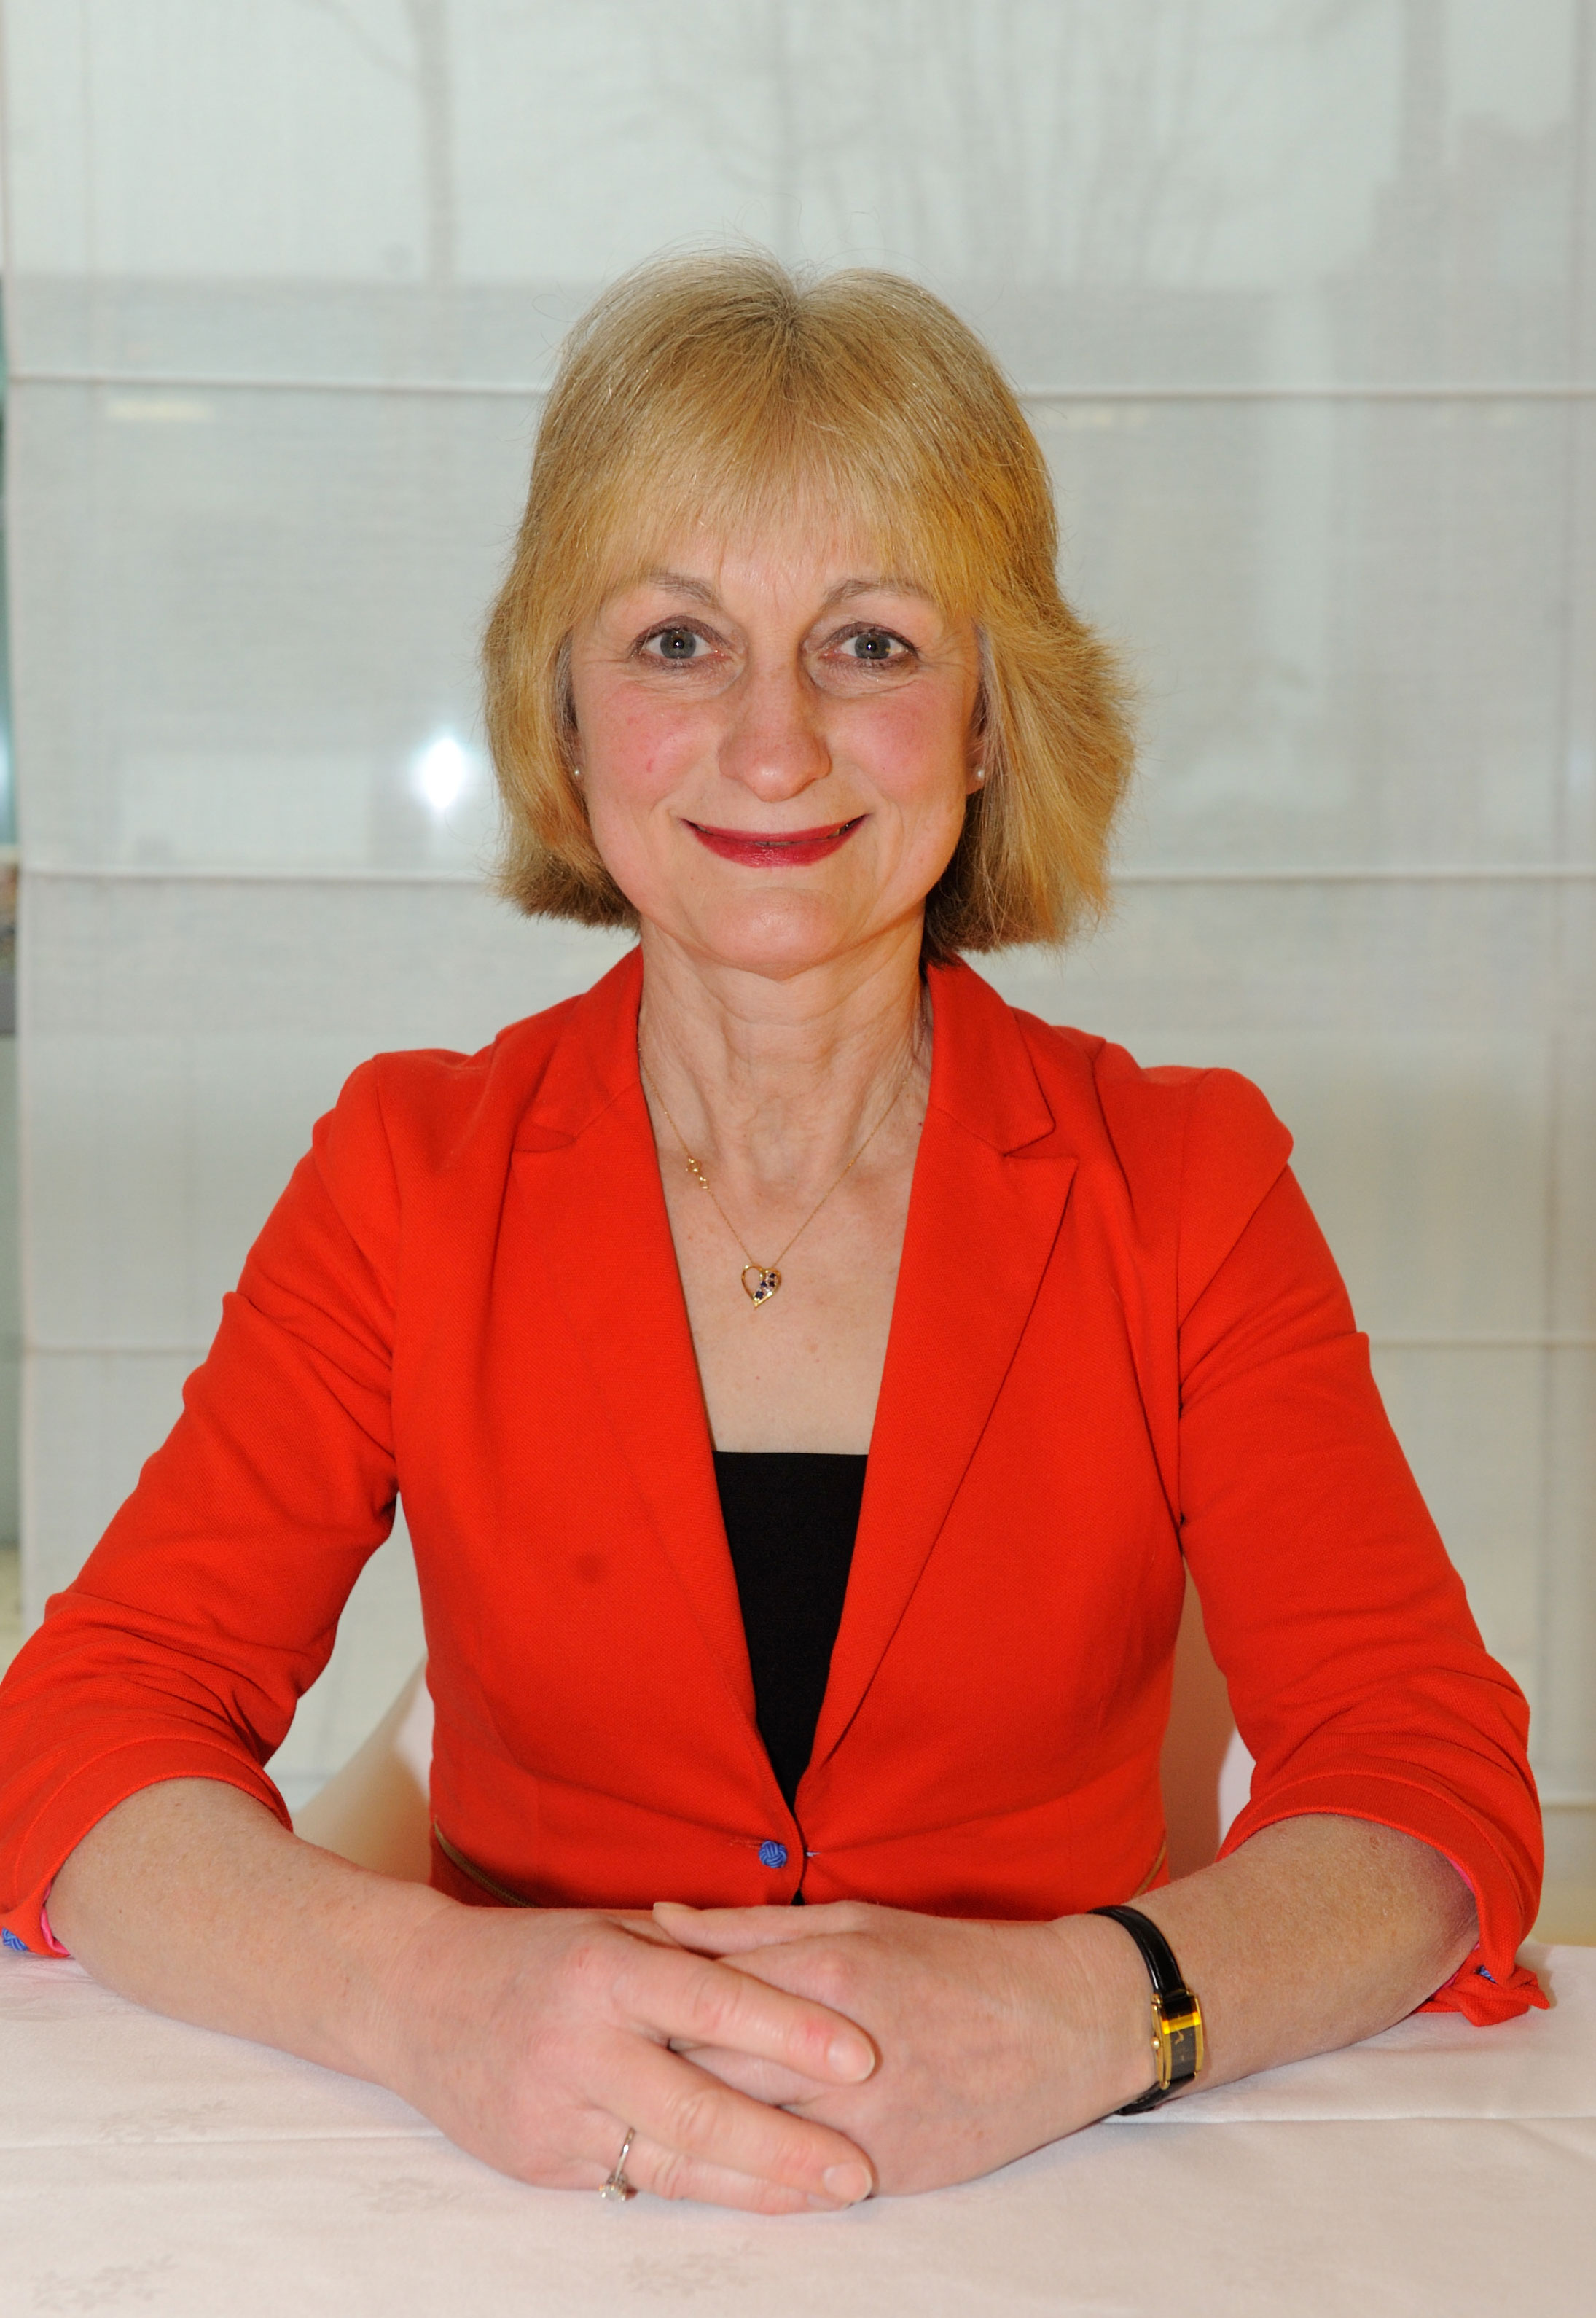 Interview d'Anne-Sophie Thuard, libraire